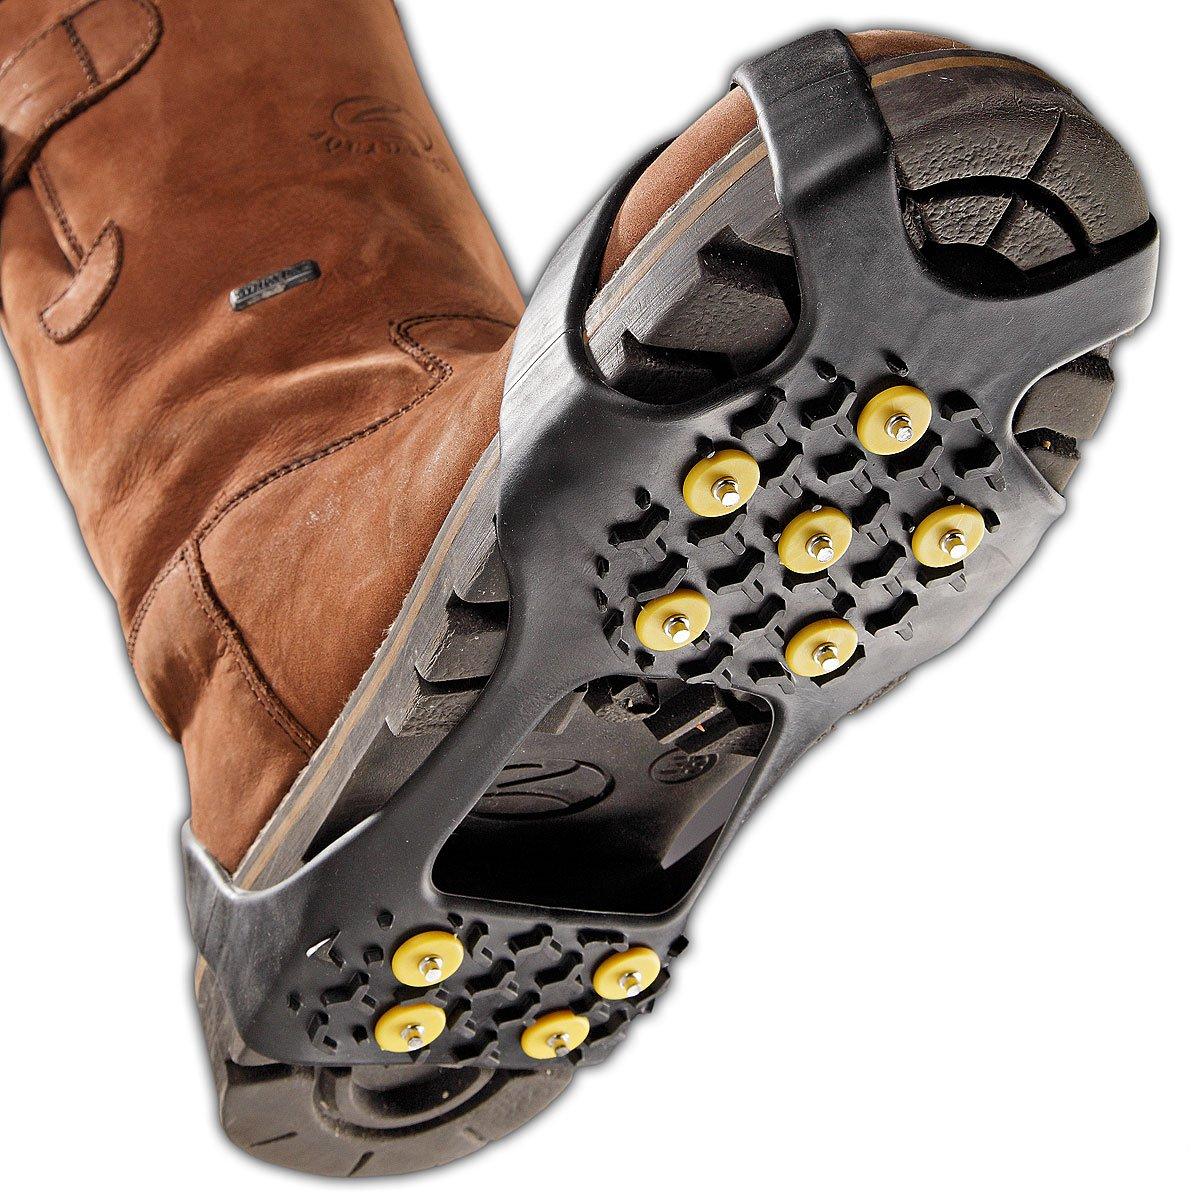 Black Canyon Schuhkrallen Shoespikes Anti Rutsch Sohle Eis